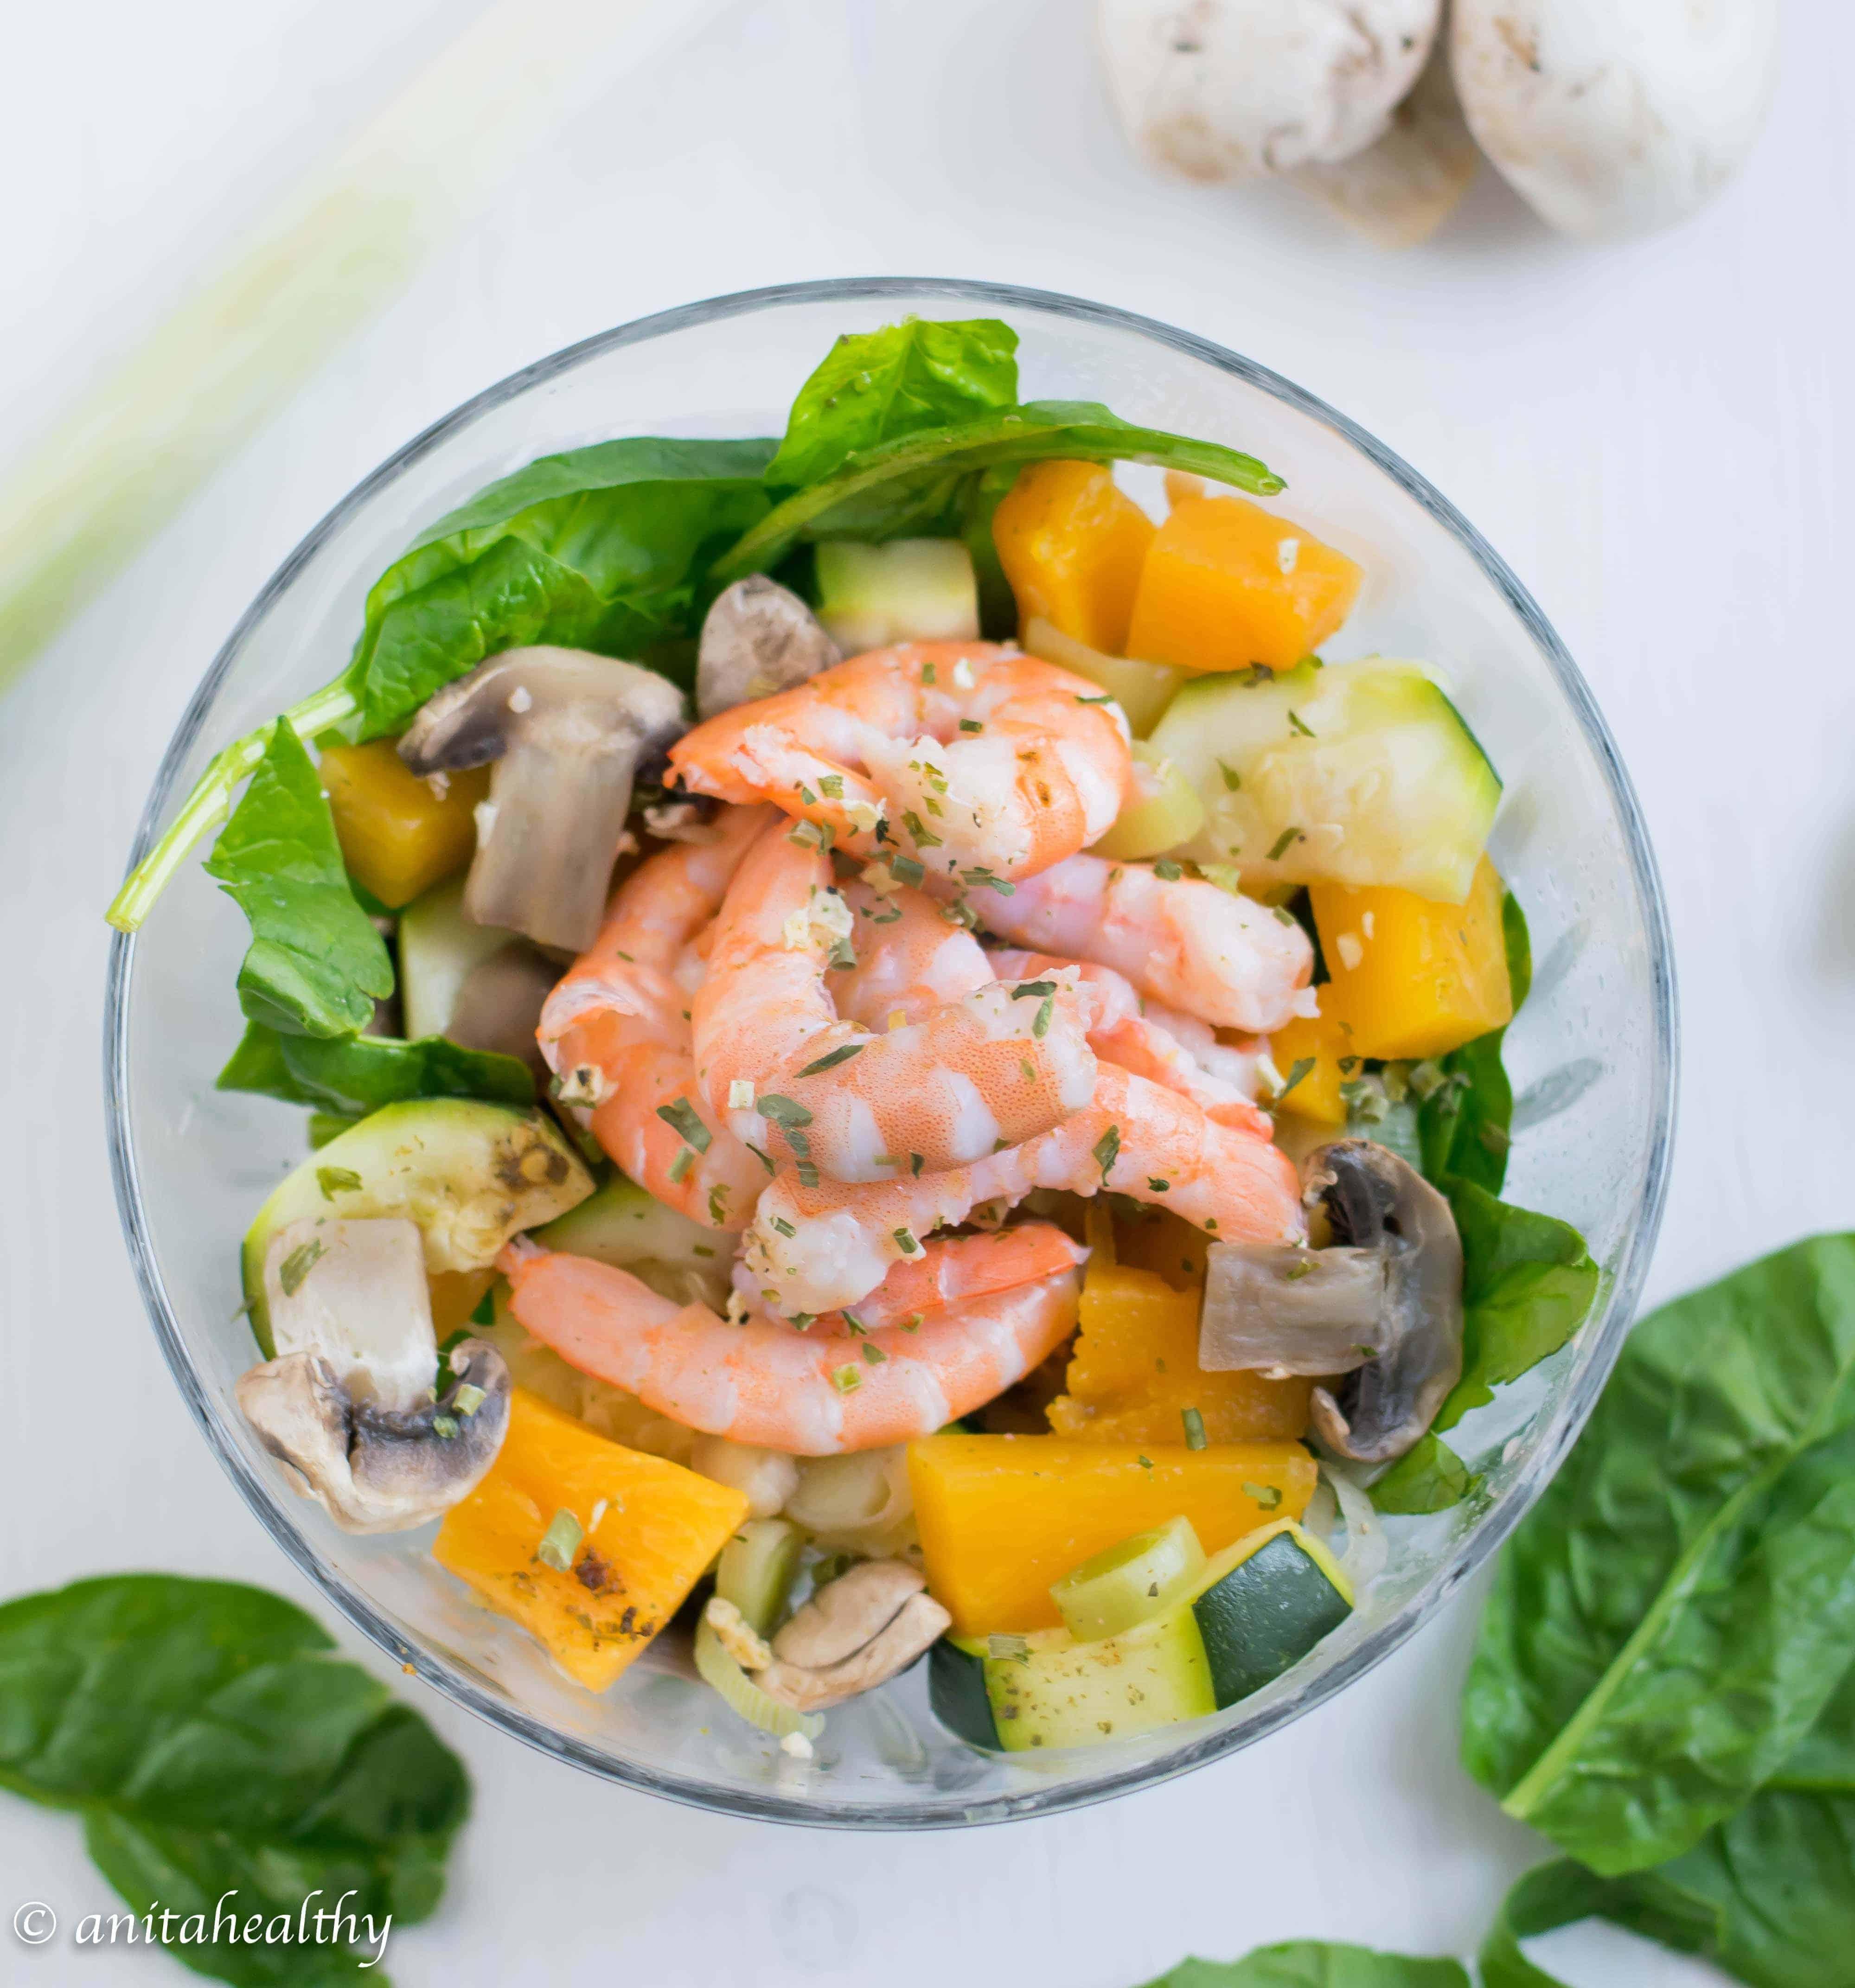 Salada de camarão   Anita Healthy